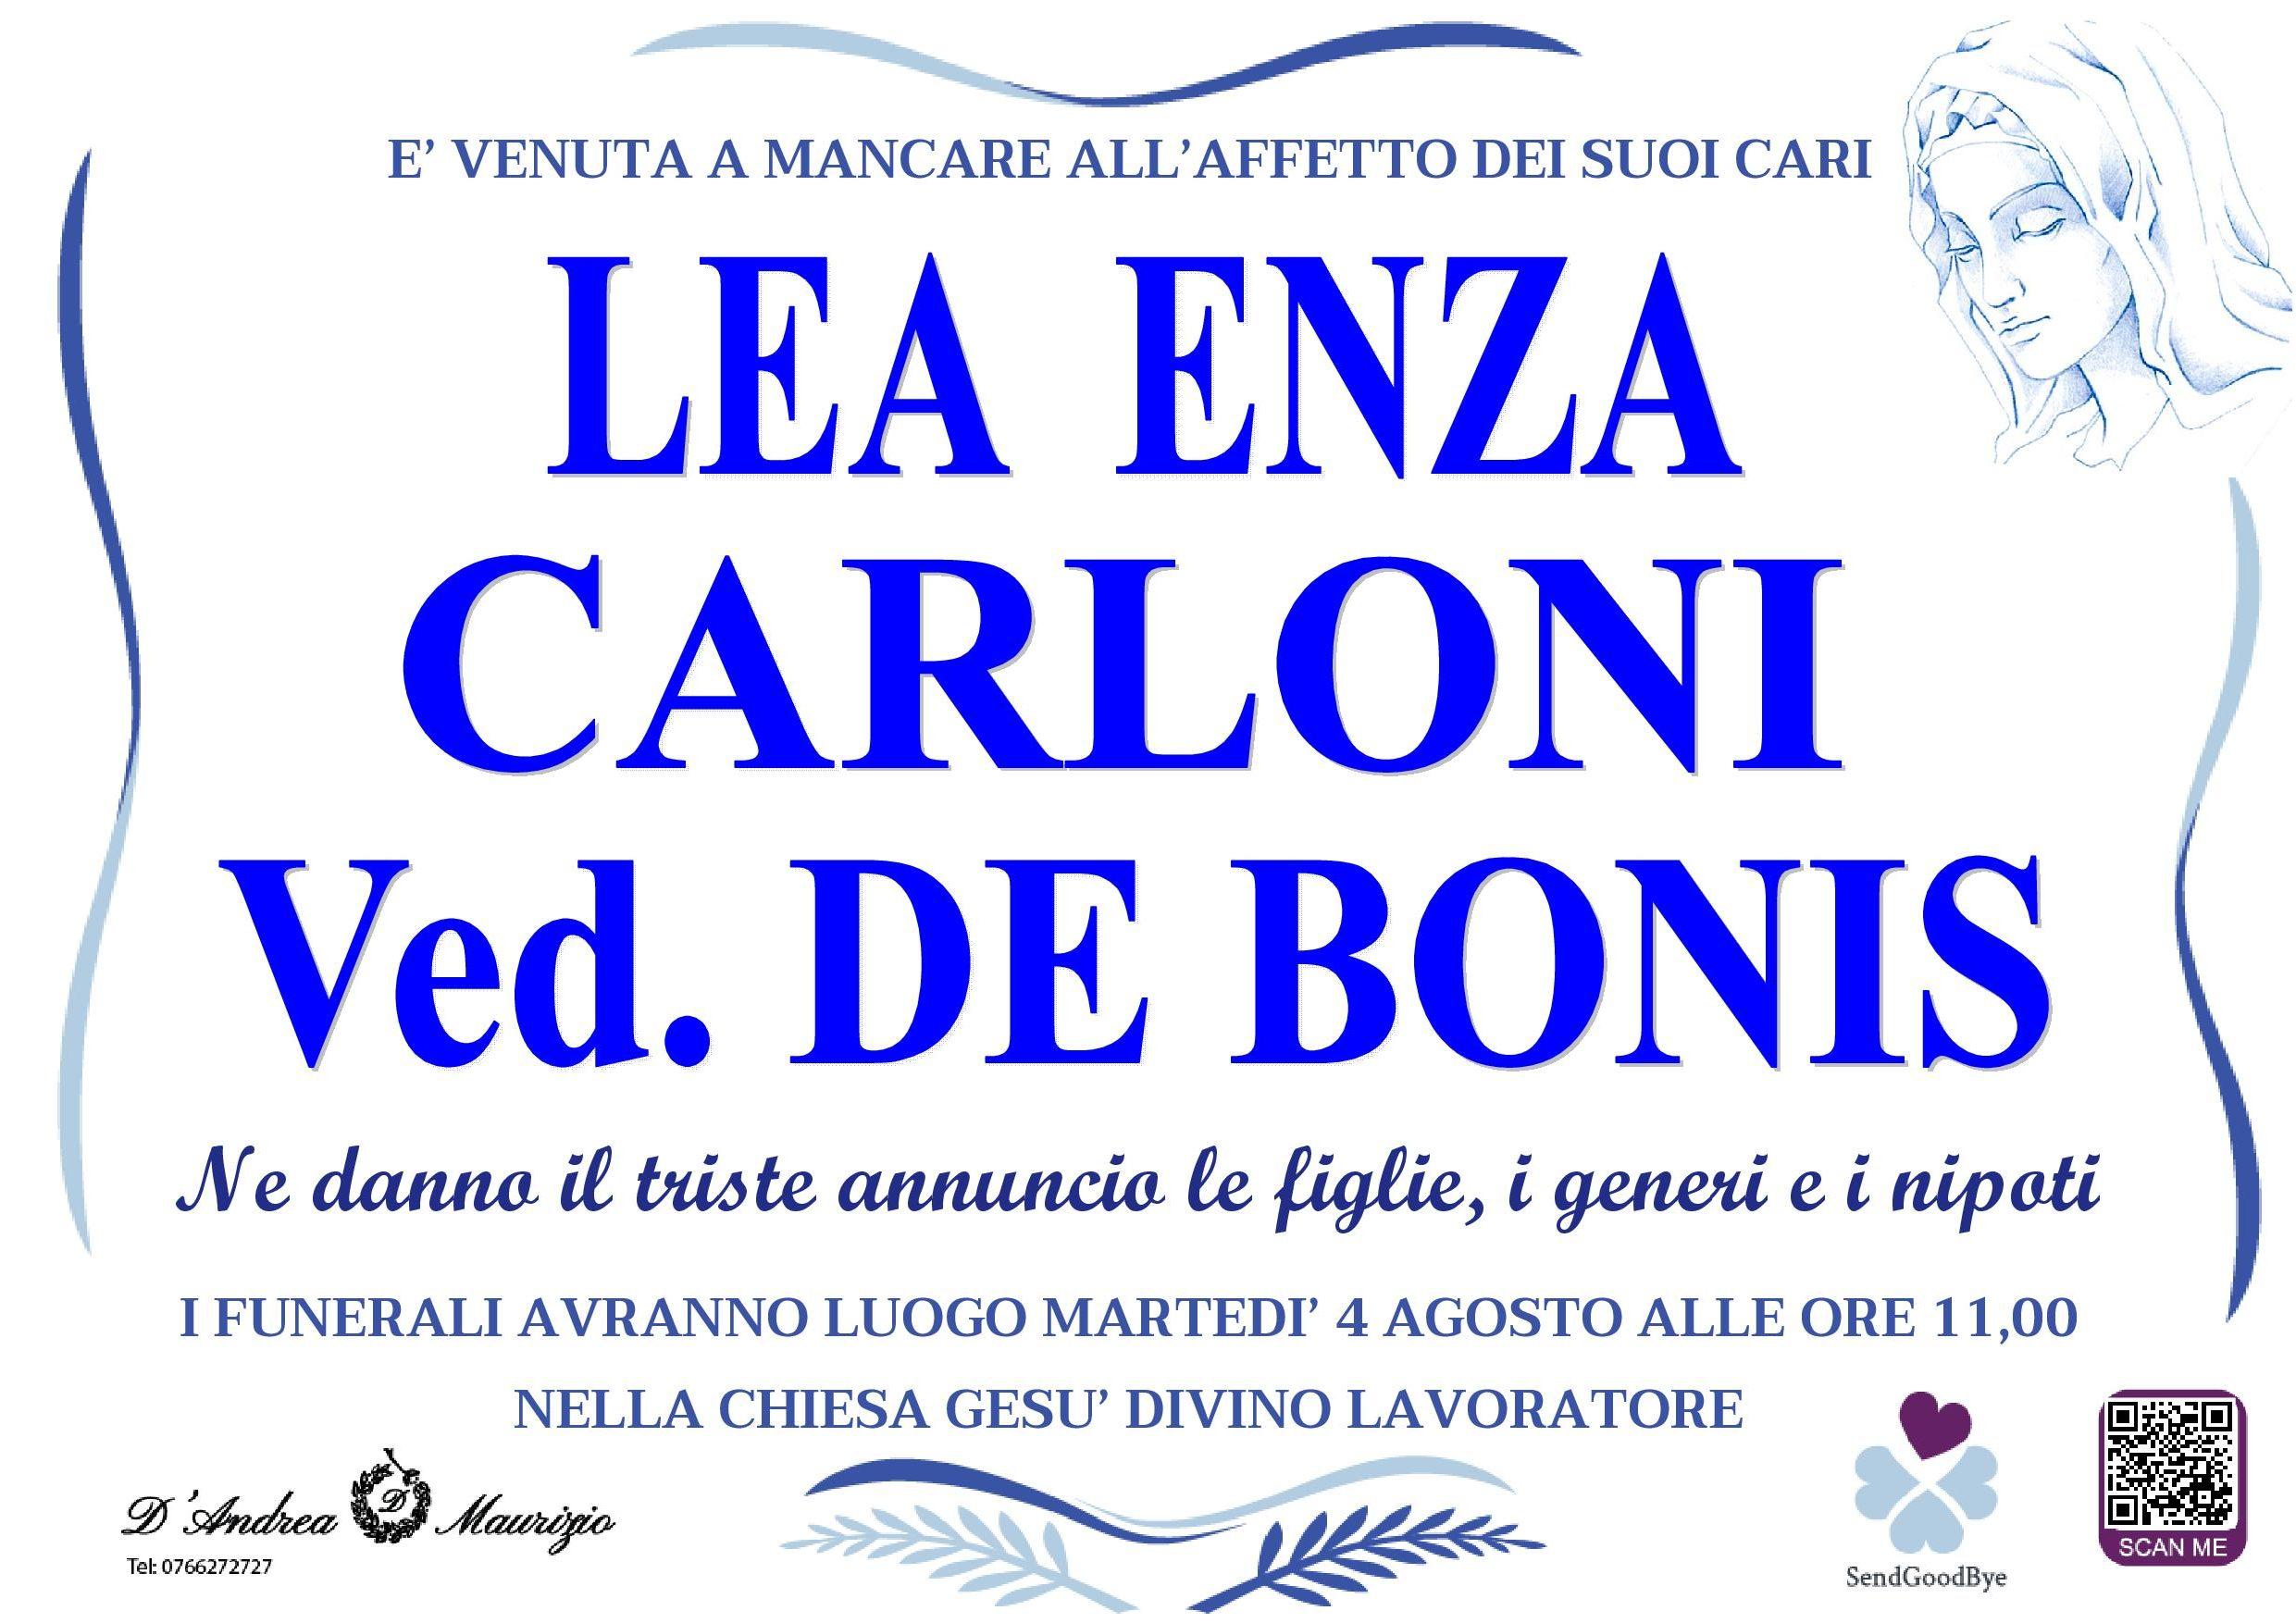 LEA ENZA CARLONI ved. DE BONIS